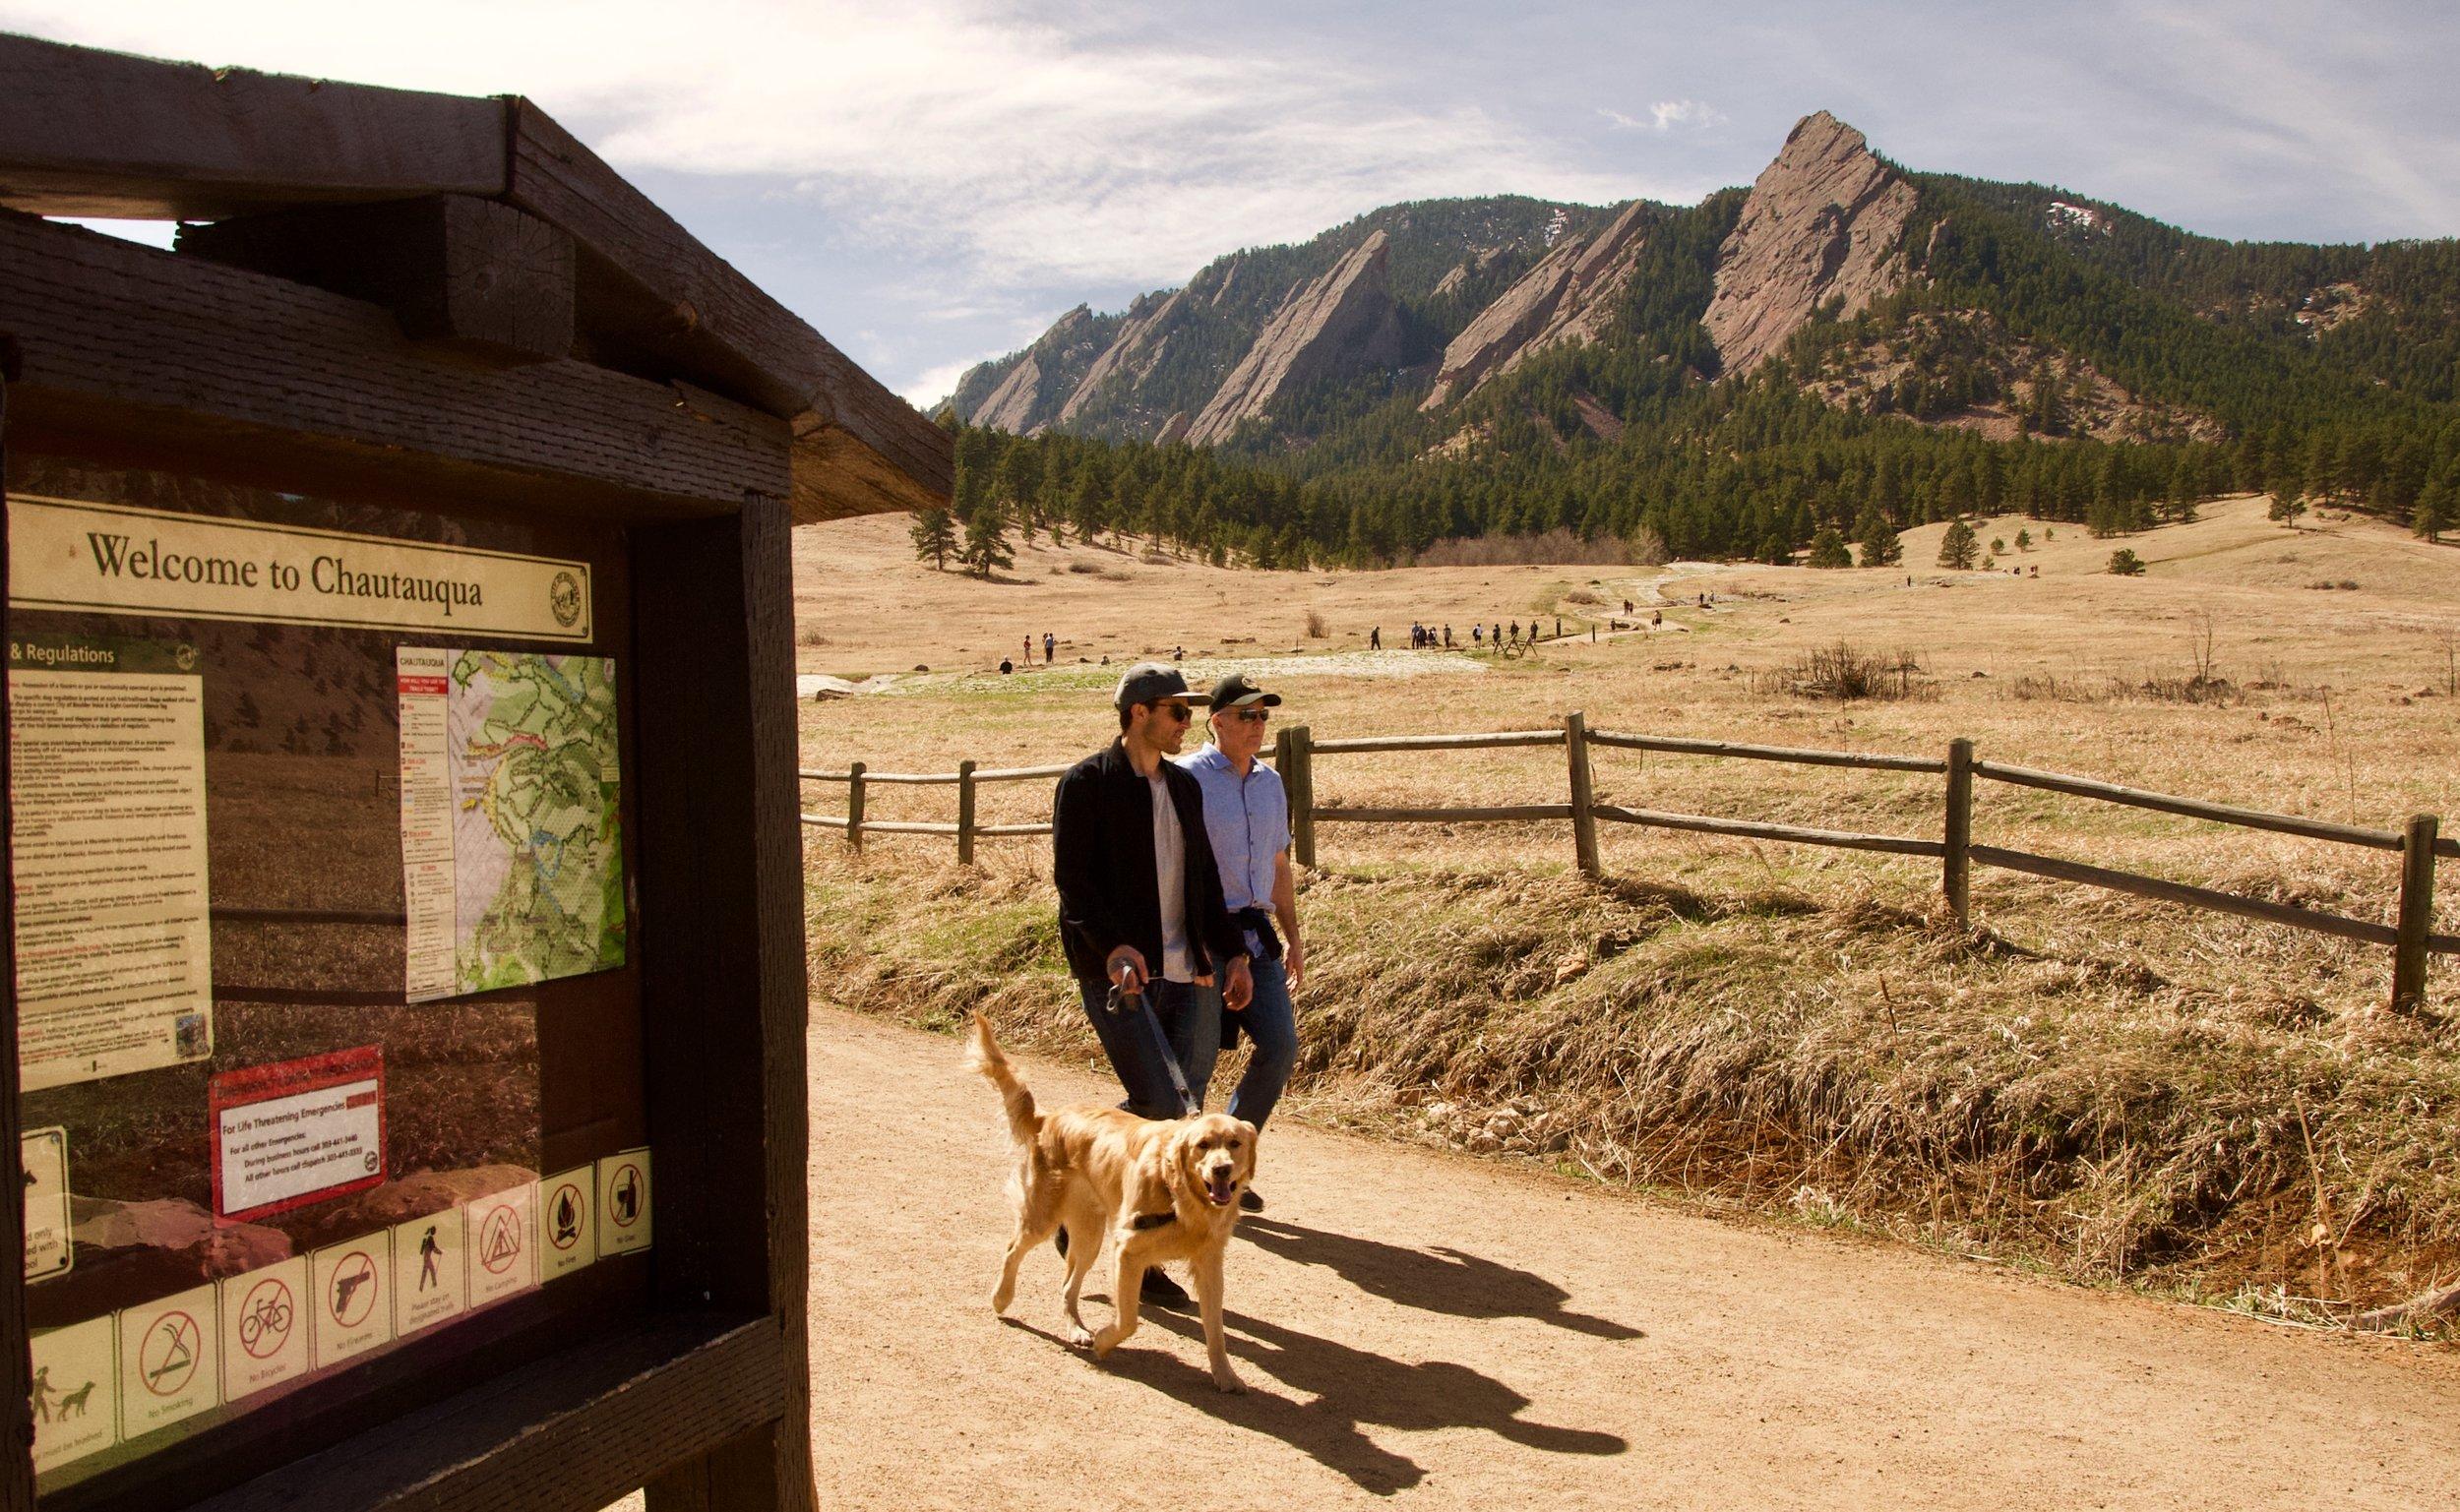 Royal Arch Trail Boulder